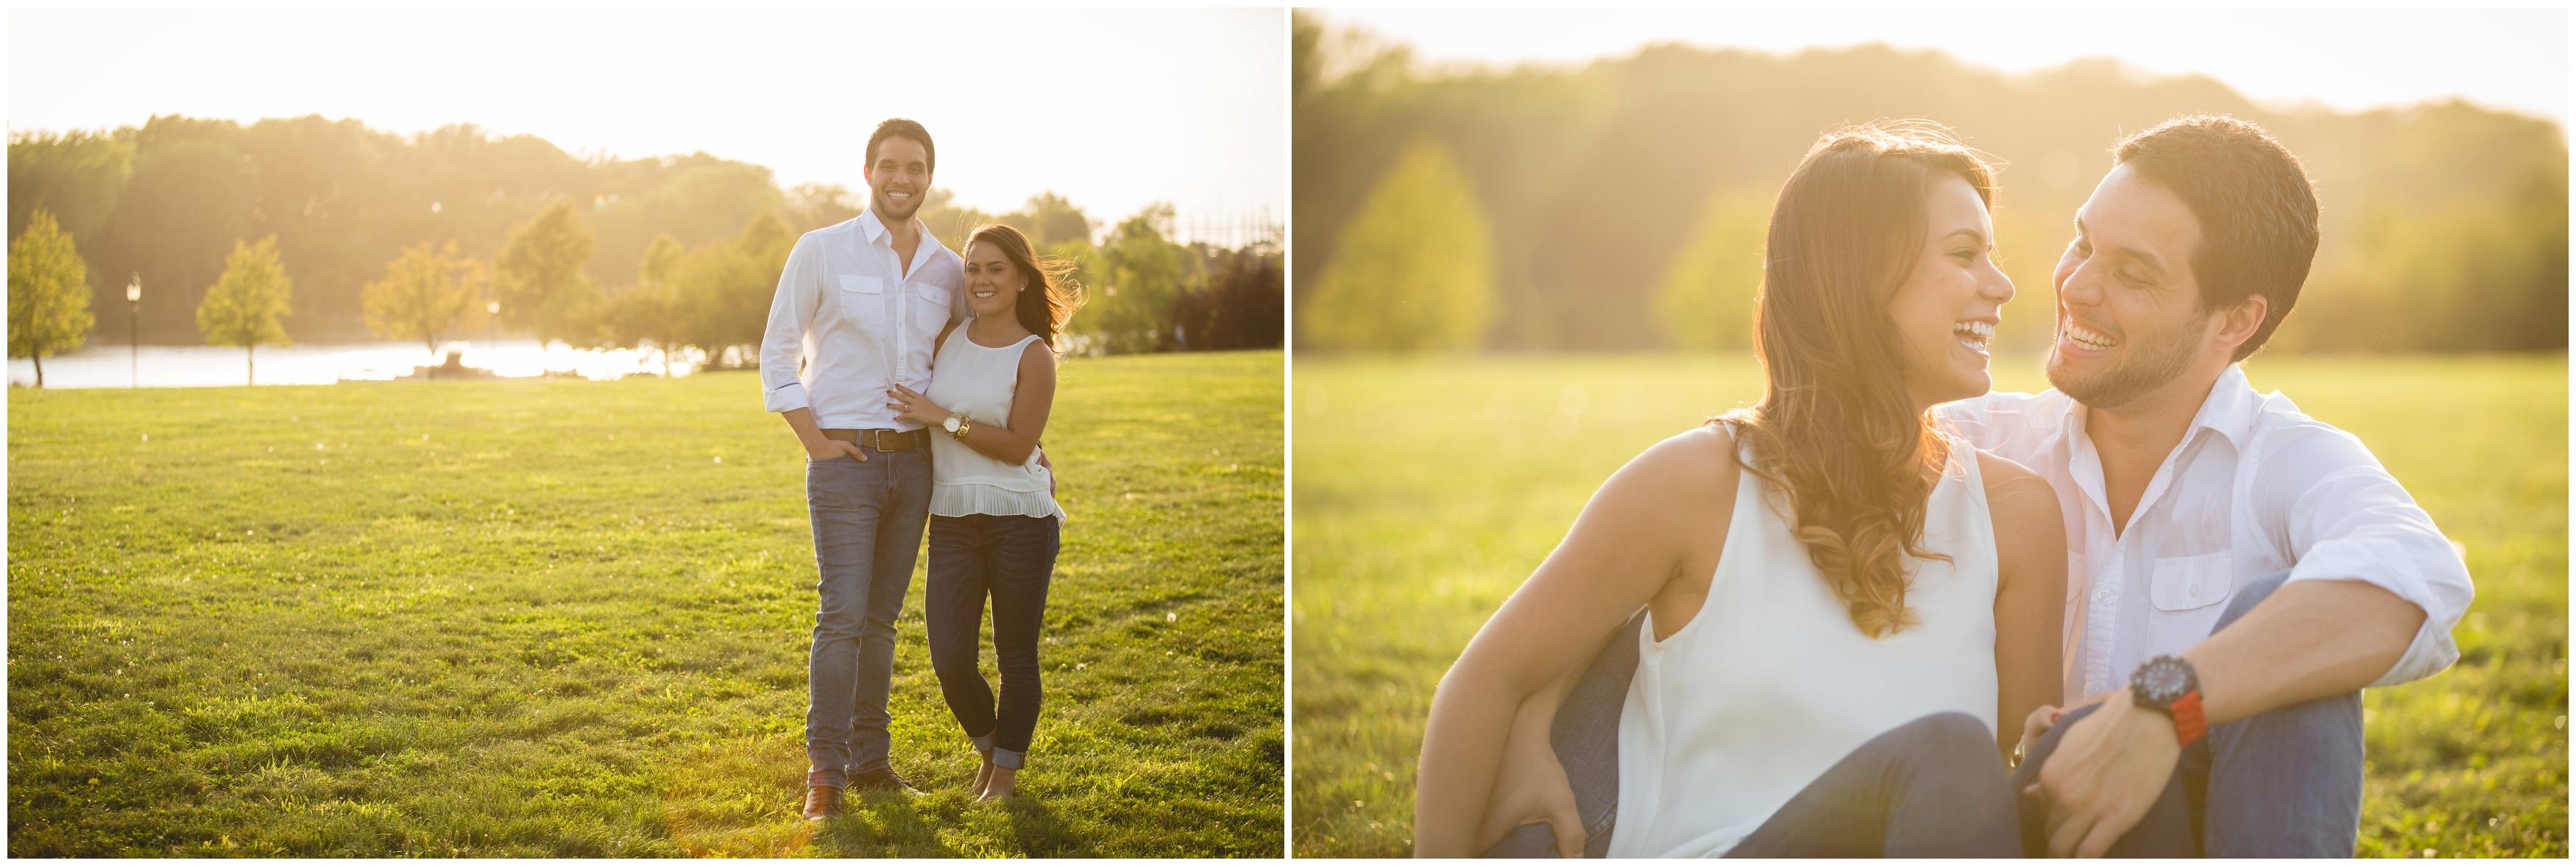 14- Wedding Photographer Minneapolis